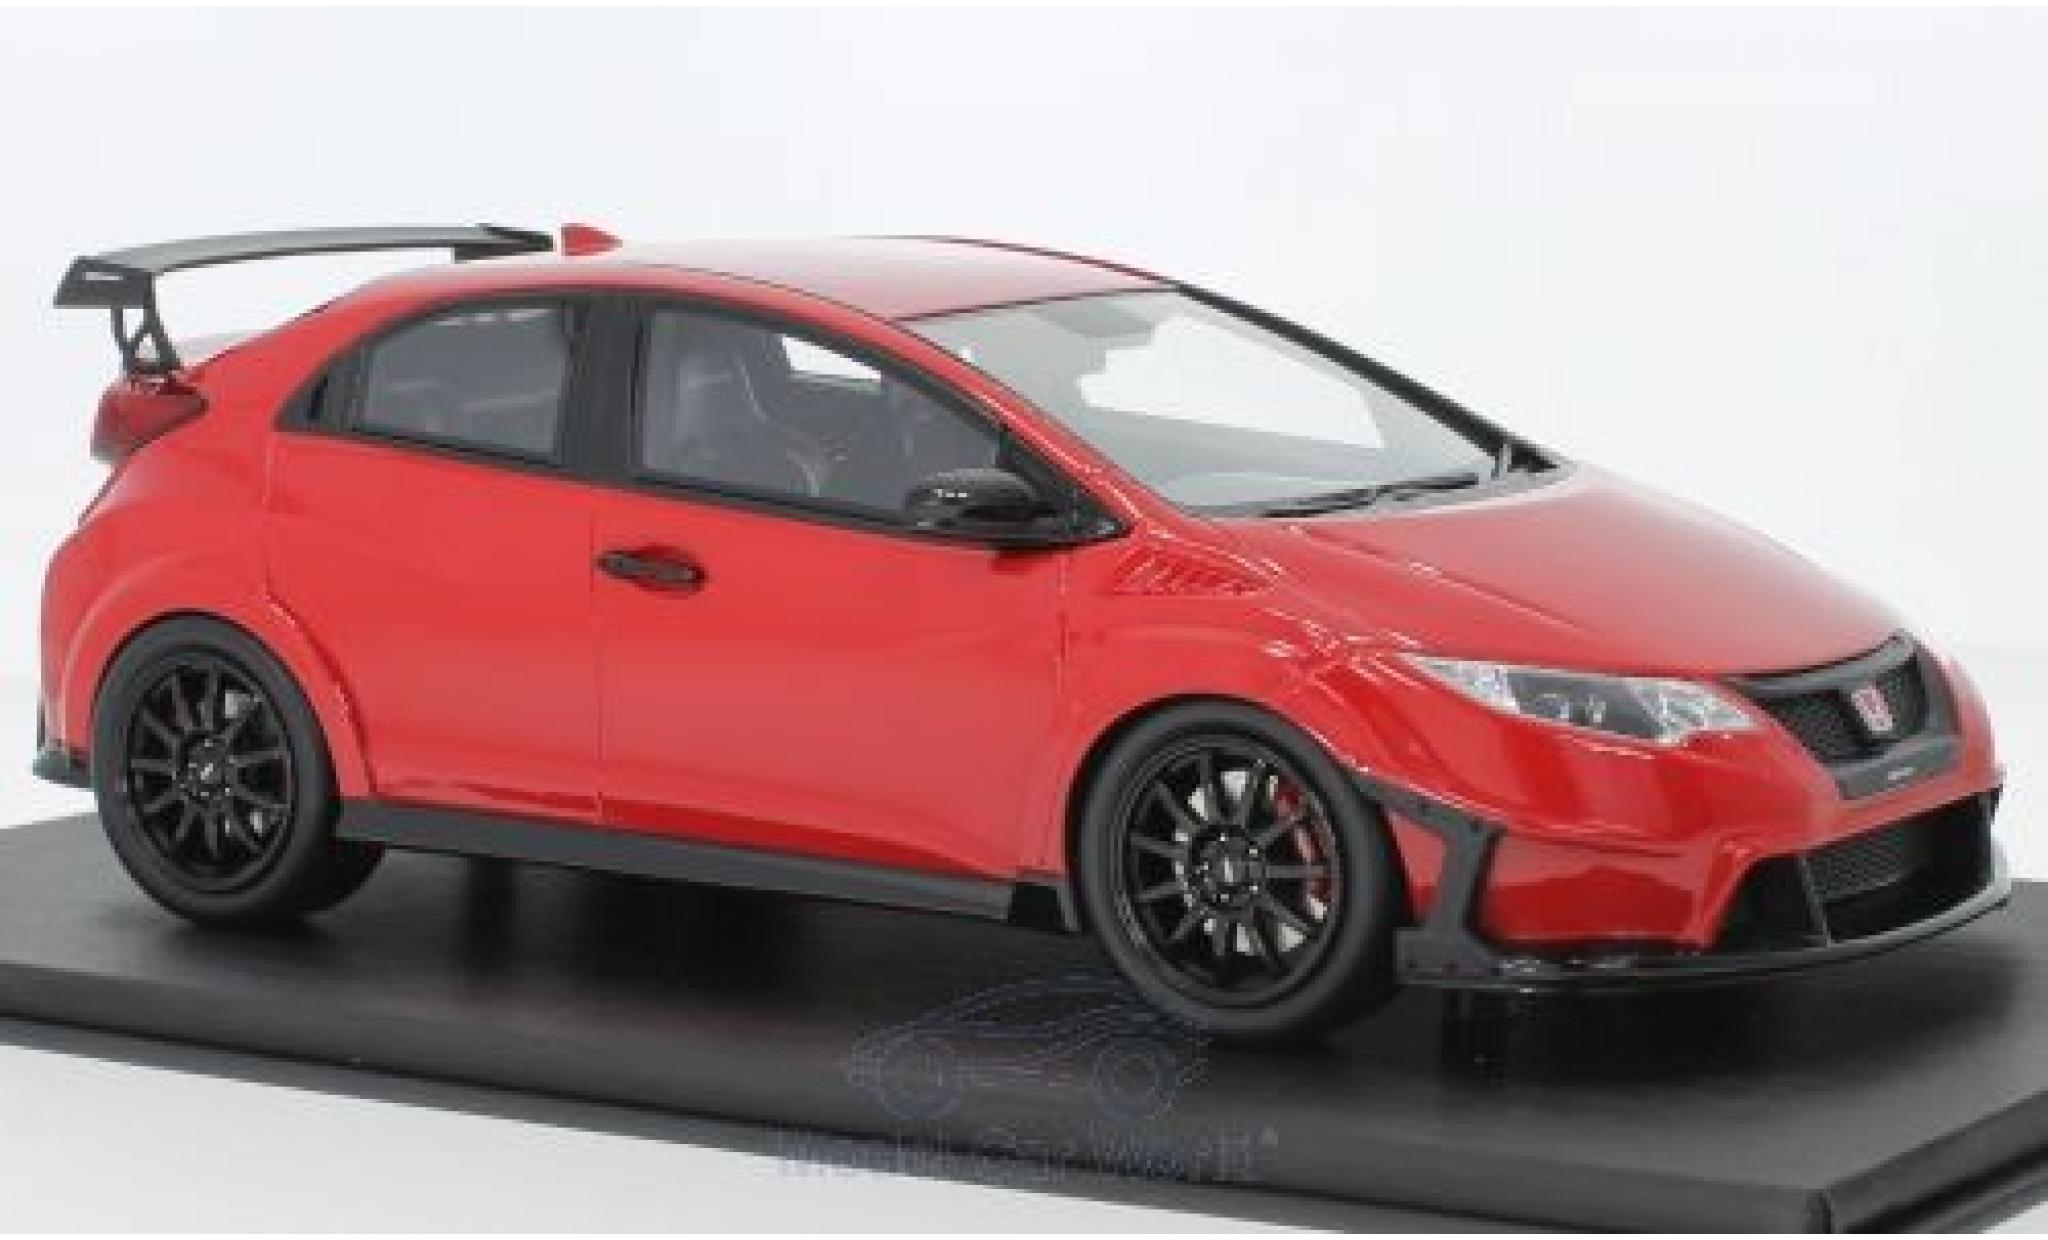 Honda Civic Type R 1/18 Top Speed Type R red RHD 2017